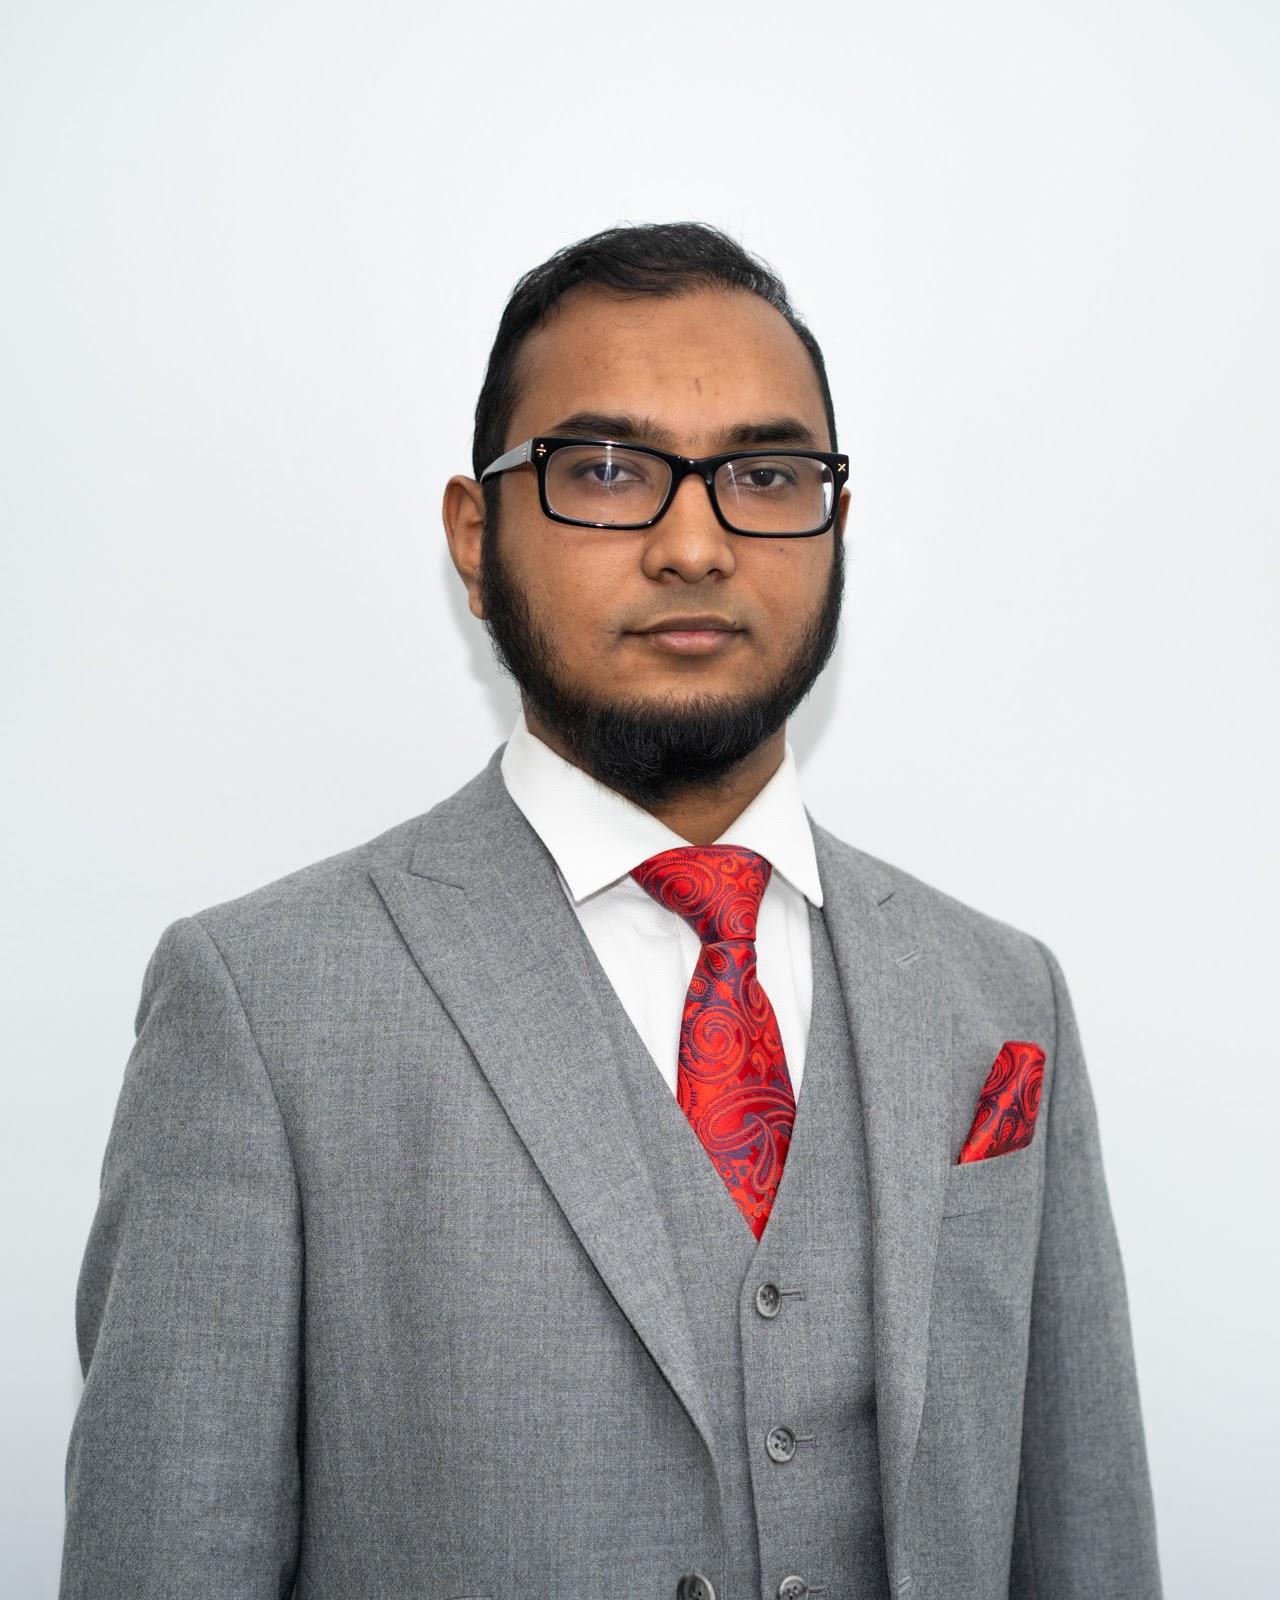 Washim Ahmed